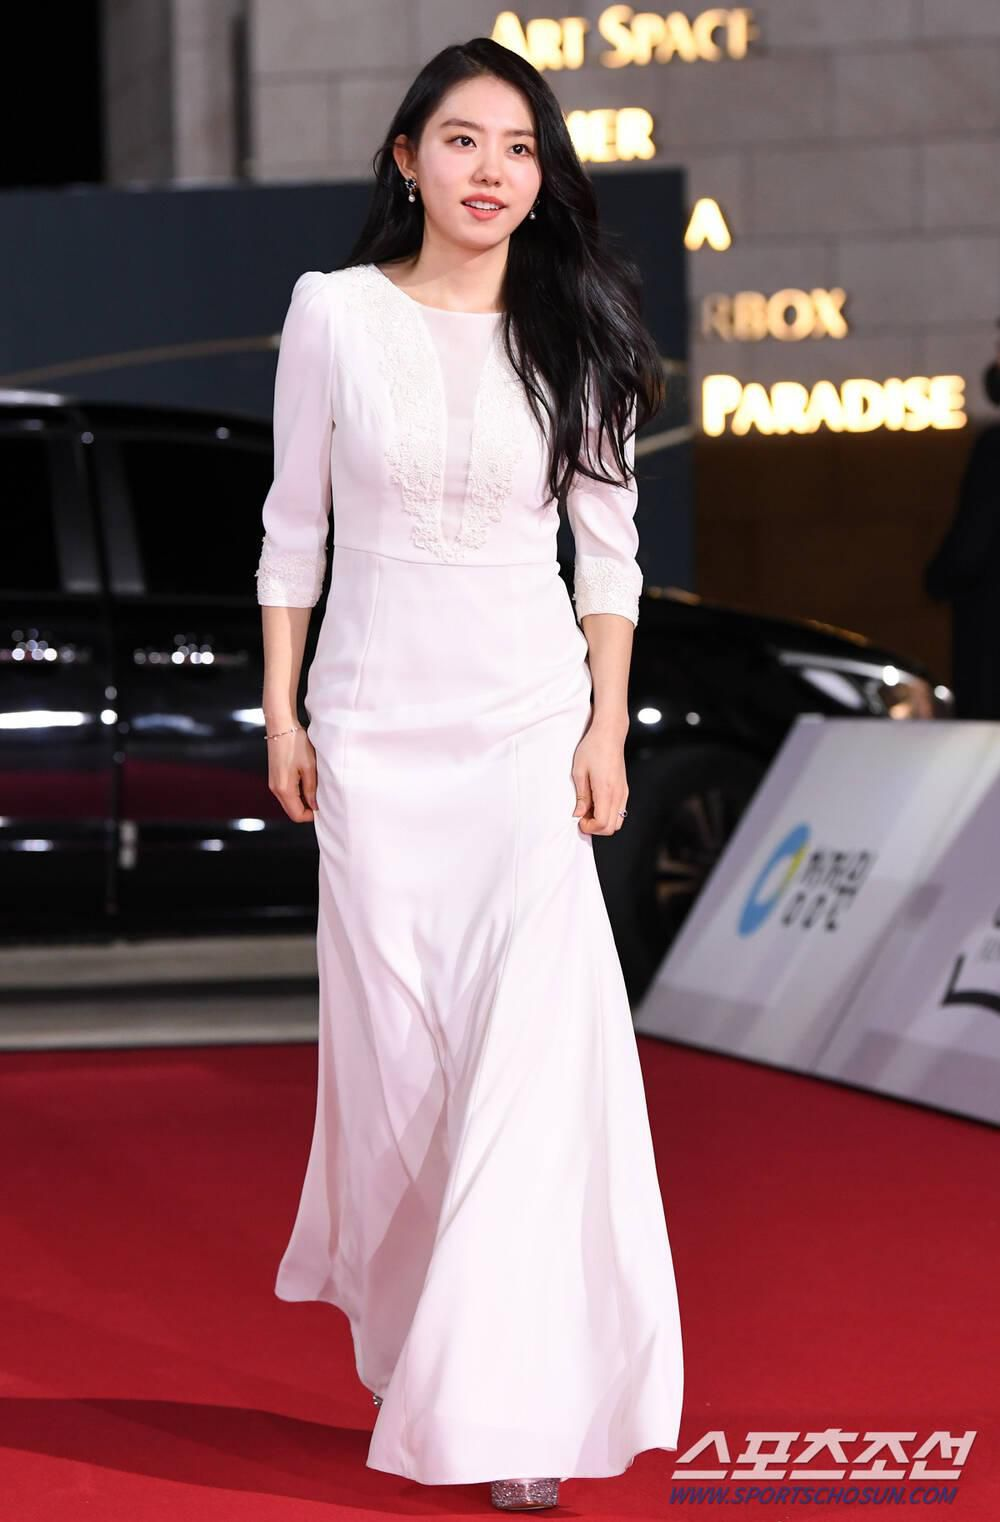 Thảm đỏ 'Rồng xanh 2020': Shin Hye Sun 'cân sắc' Shin Min Ah, Jung Woo Sung - Lee Byung Hun điển trai! Ảnh 43